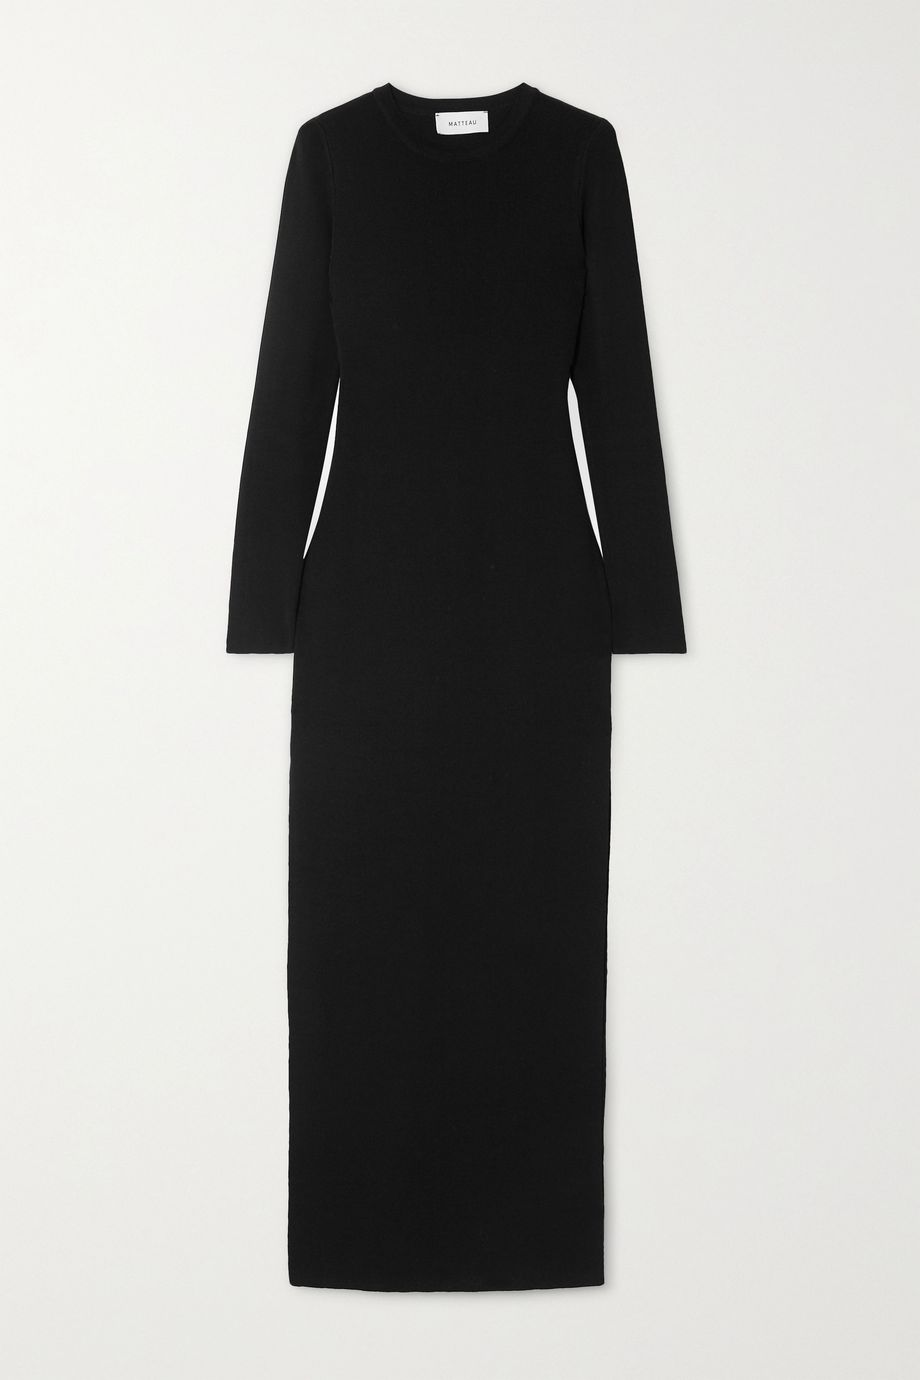 Matteau Stretch-knit maxi dress